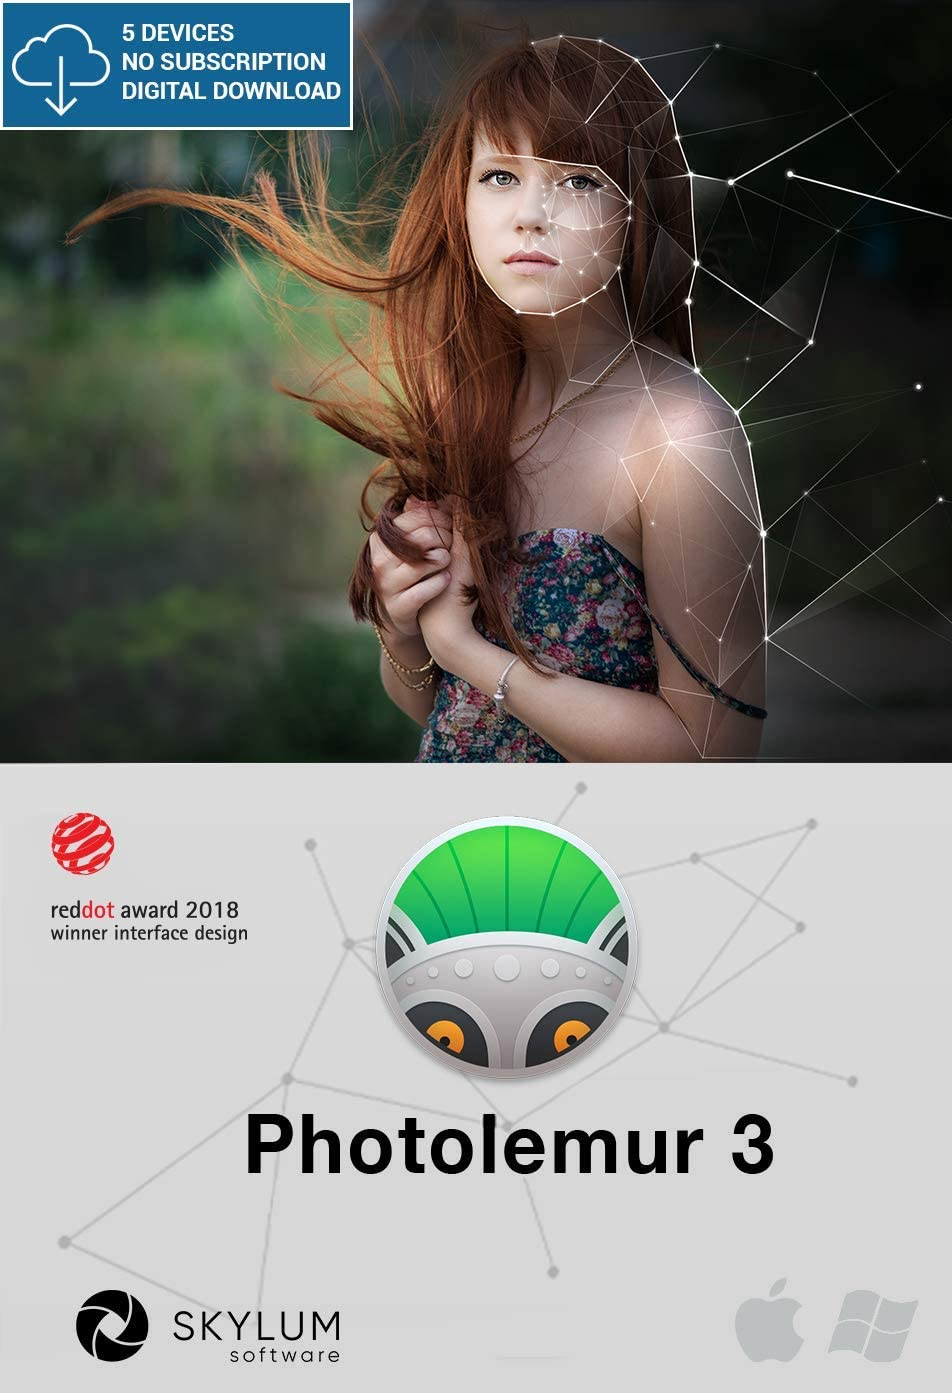 Photolemur 3 - Automatic Photo Enhancing Software [Mac Download]